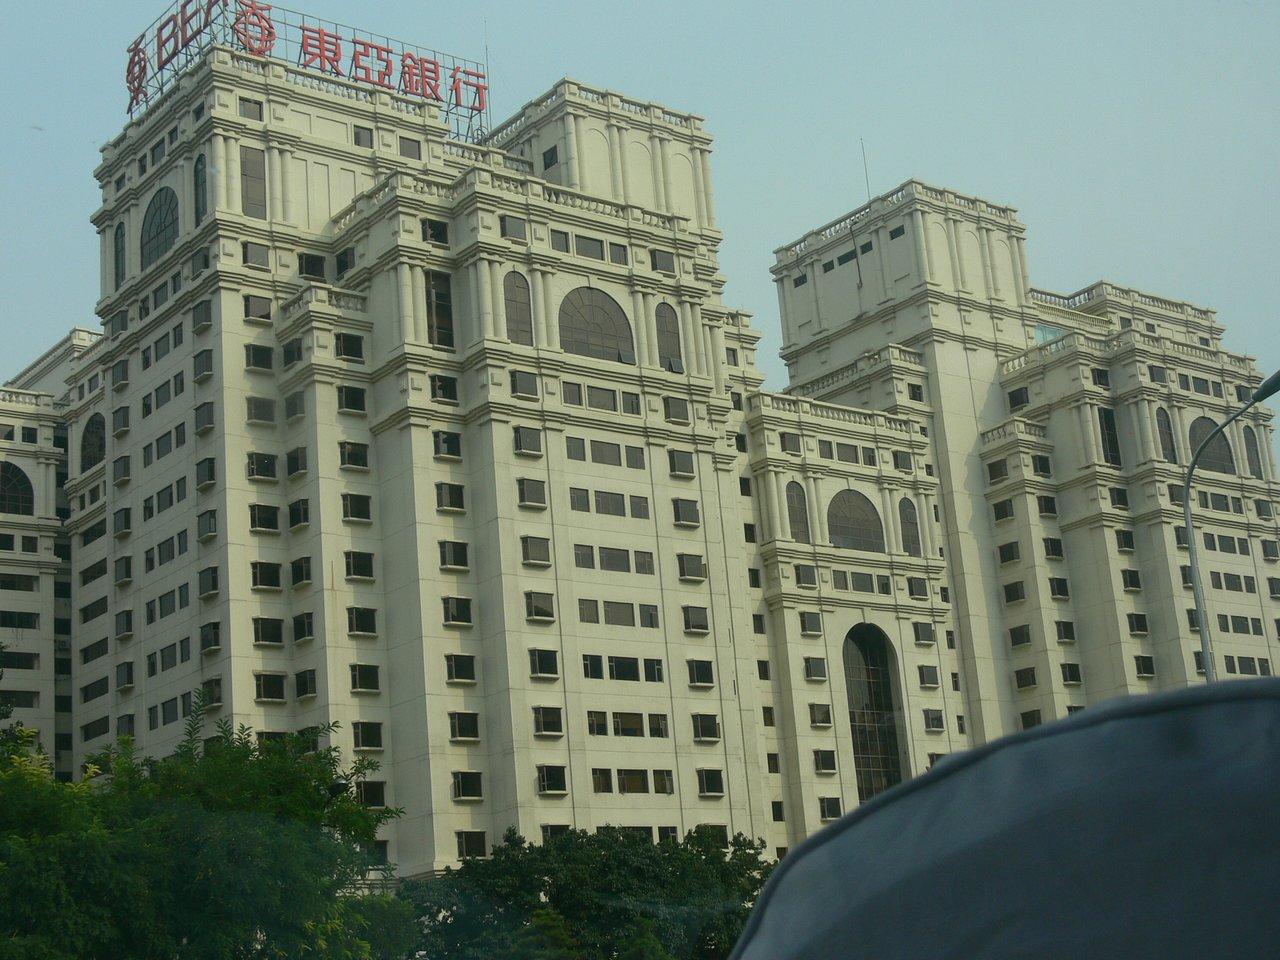 Kerry Hotel Beijing 127 1 7 8 Updated 2018 Prices Reviews China Tripadvisor